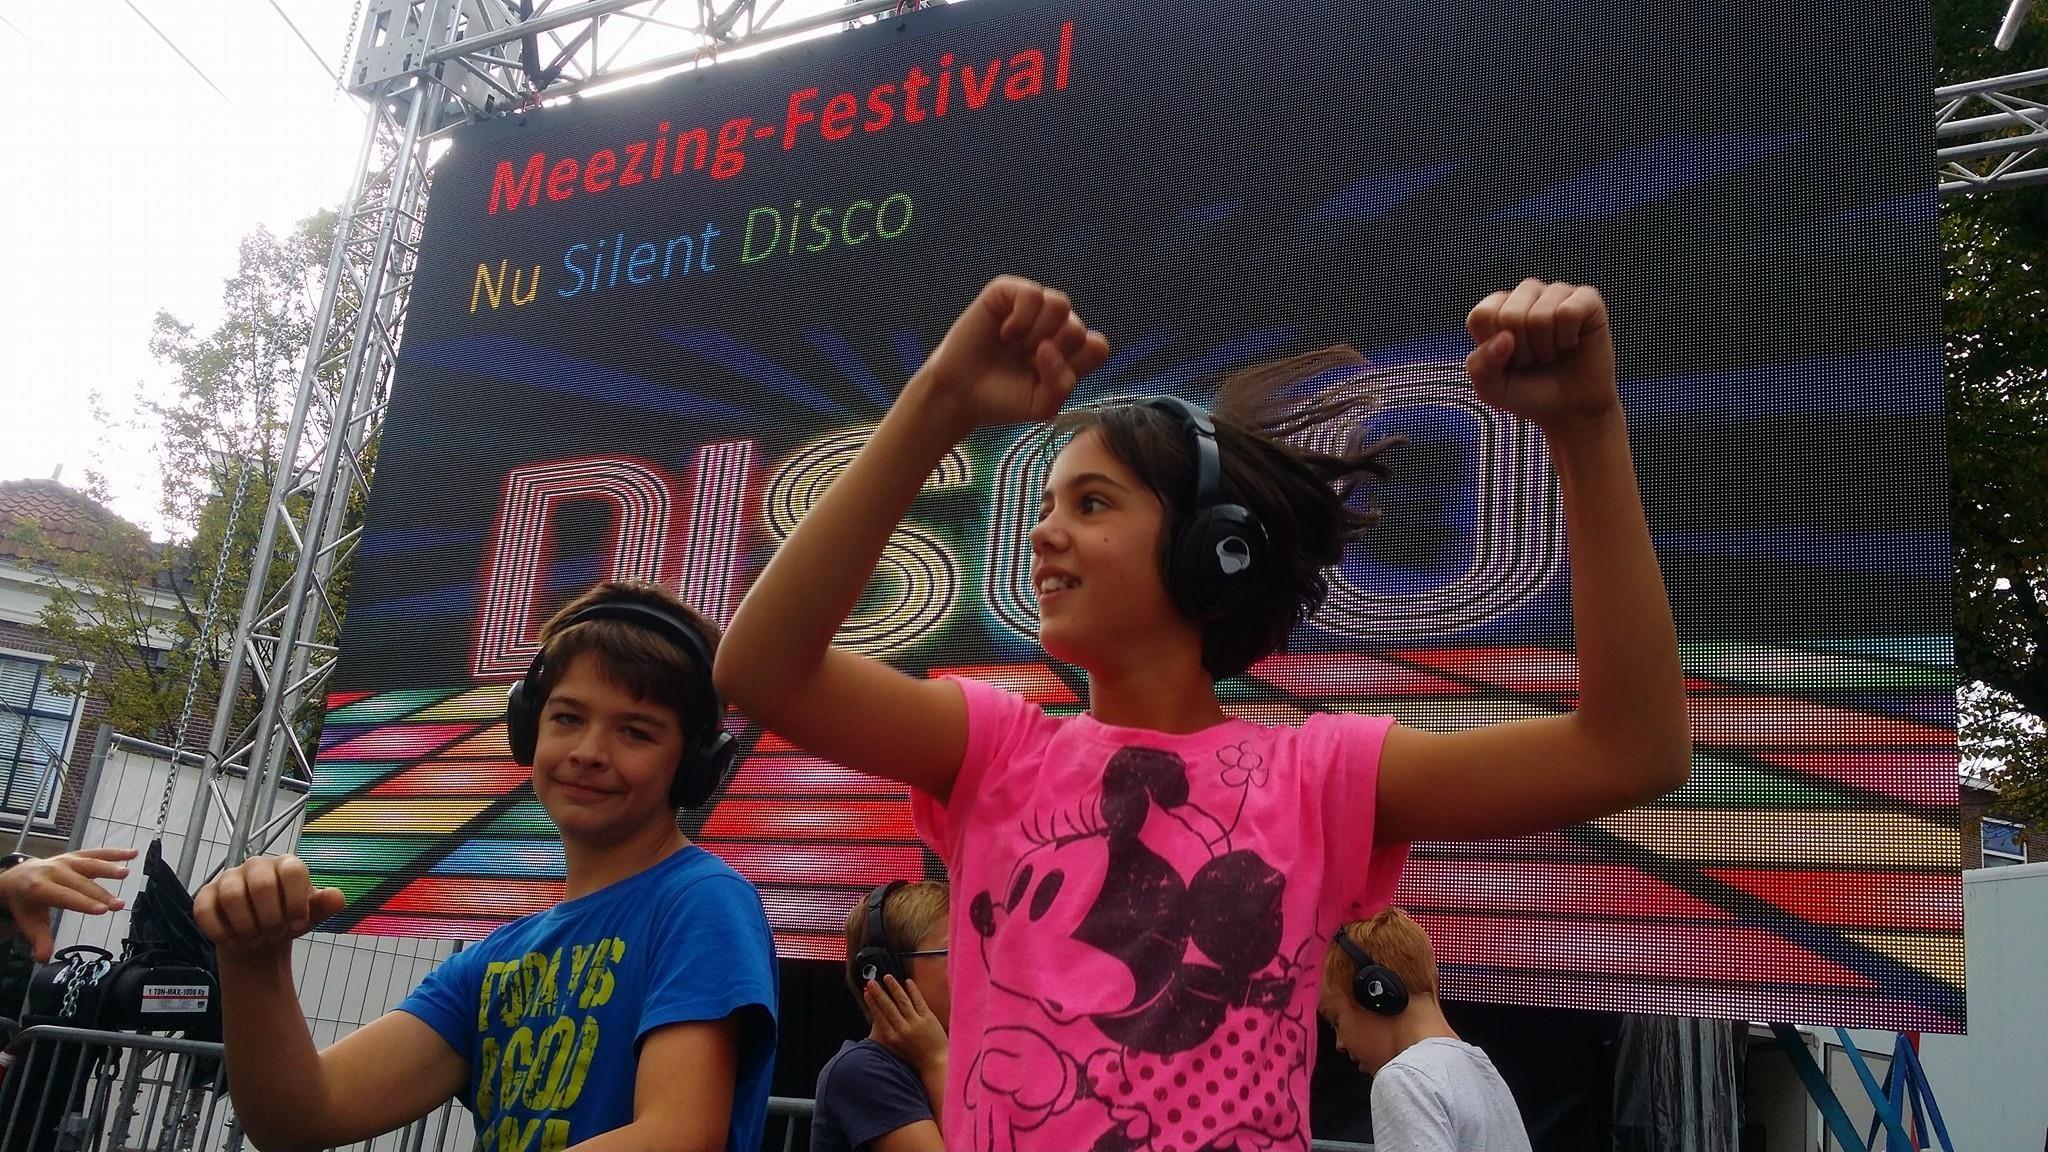 Silent disco feest @ 3 Oktober-viering Leids ontzet